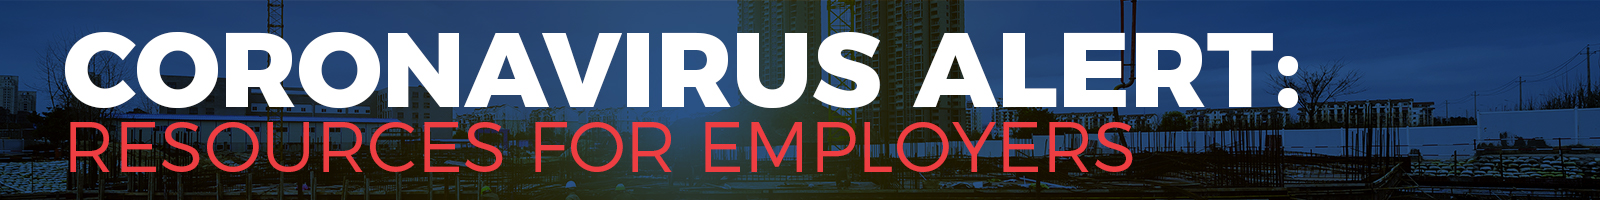 Coronavirus Alert: Resources for Employers